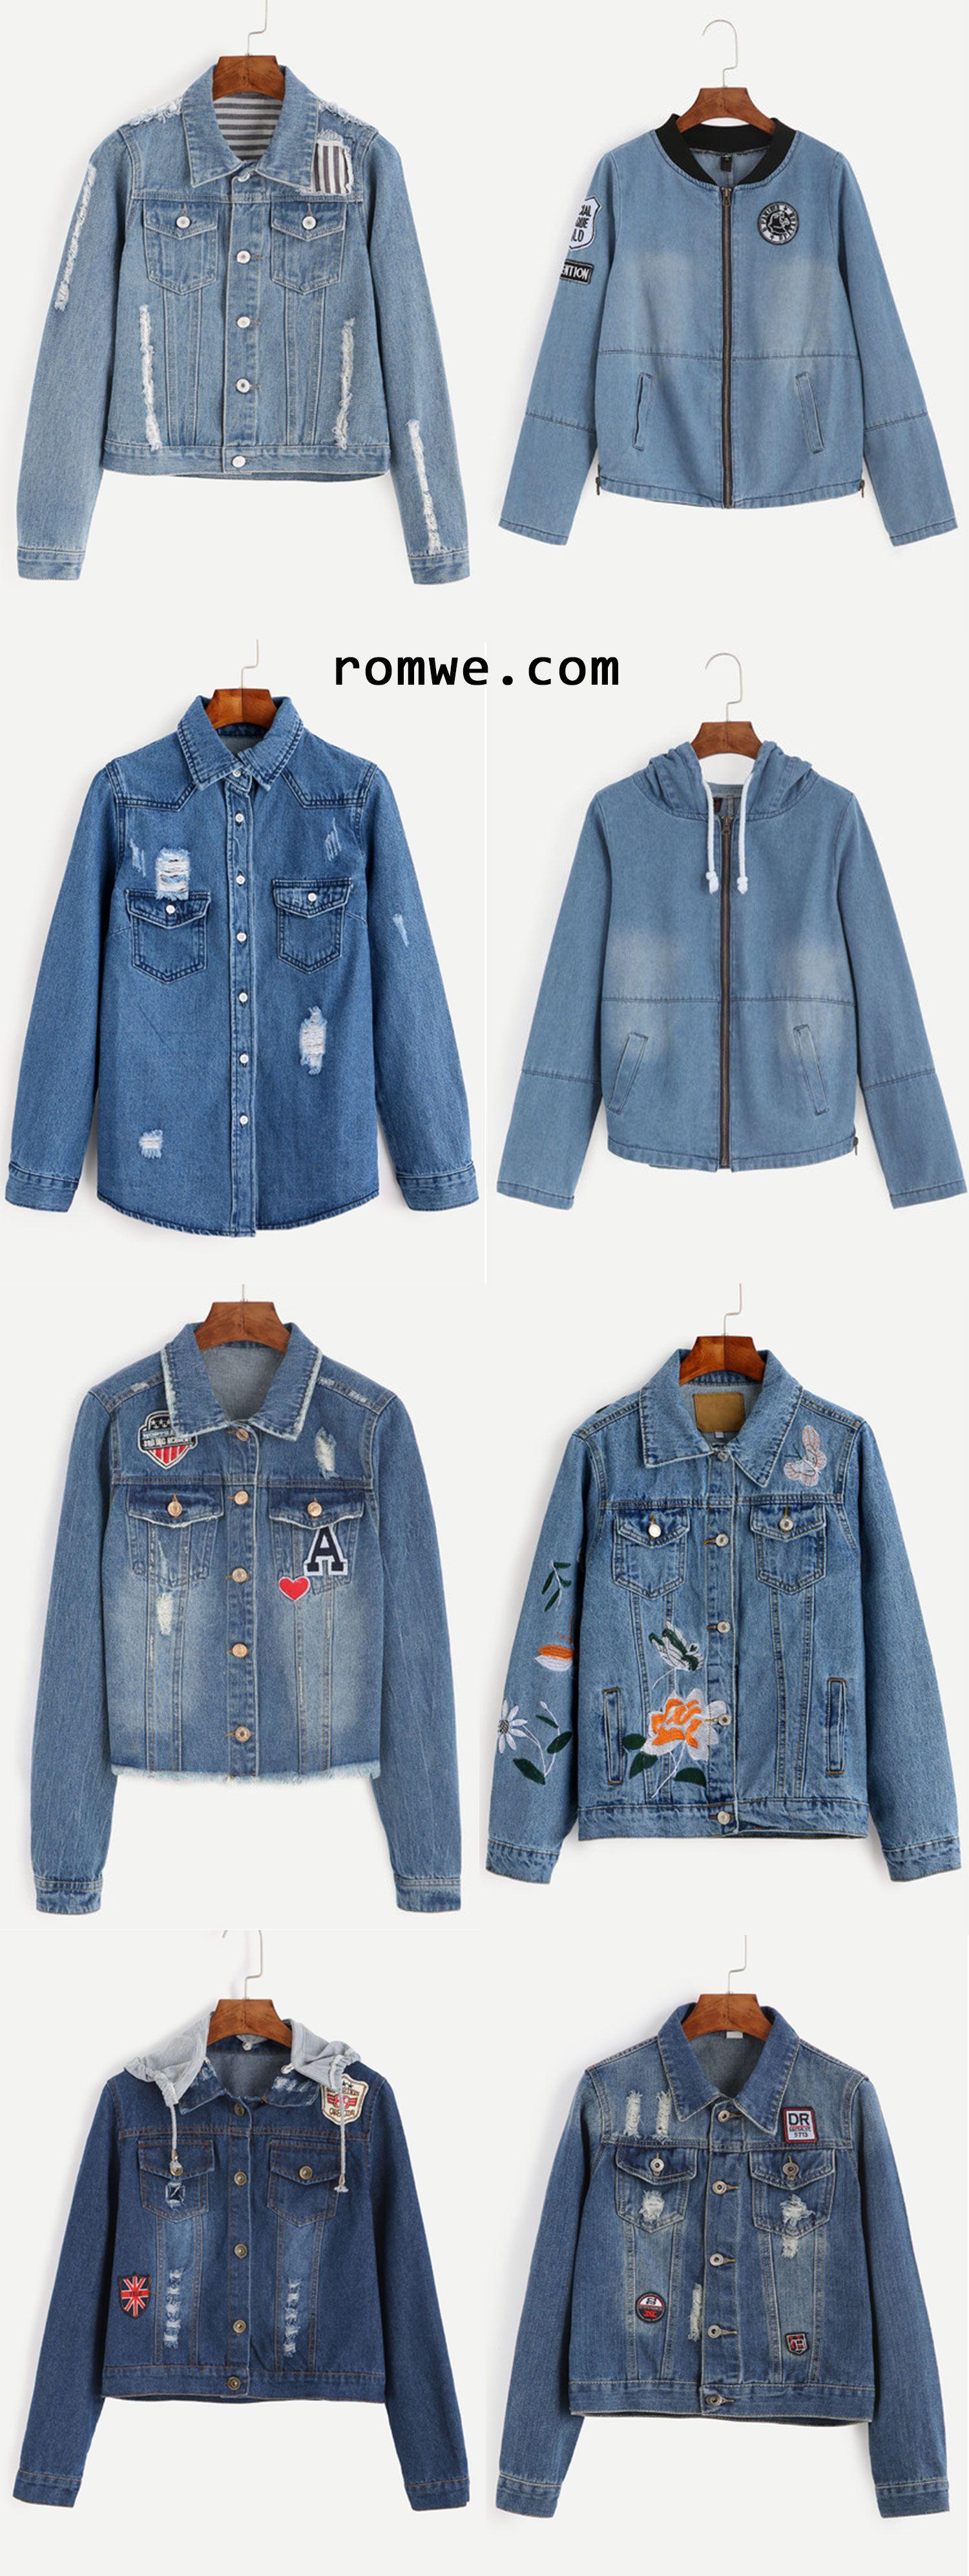 Denim Jackets Street Fashion Romwe Com Denim Fashion Denim Jacket Diy Denim Jacket [ 3988 x 1500 Pixel ]